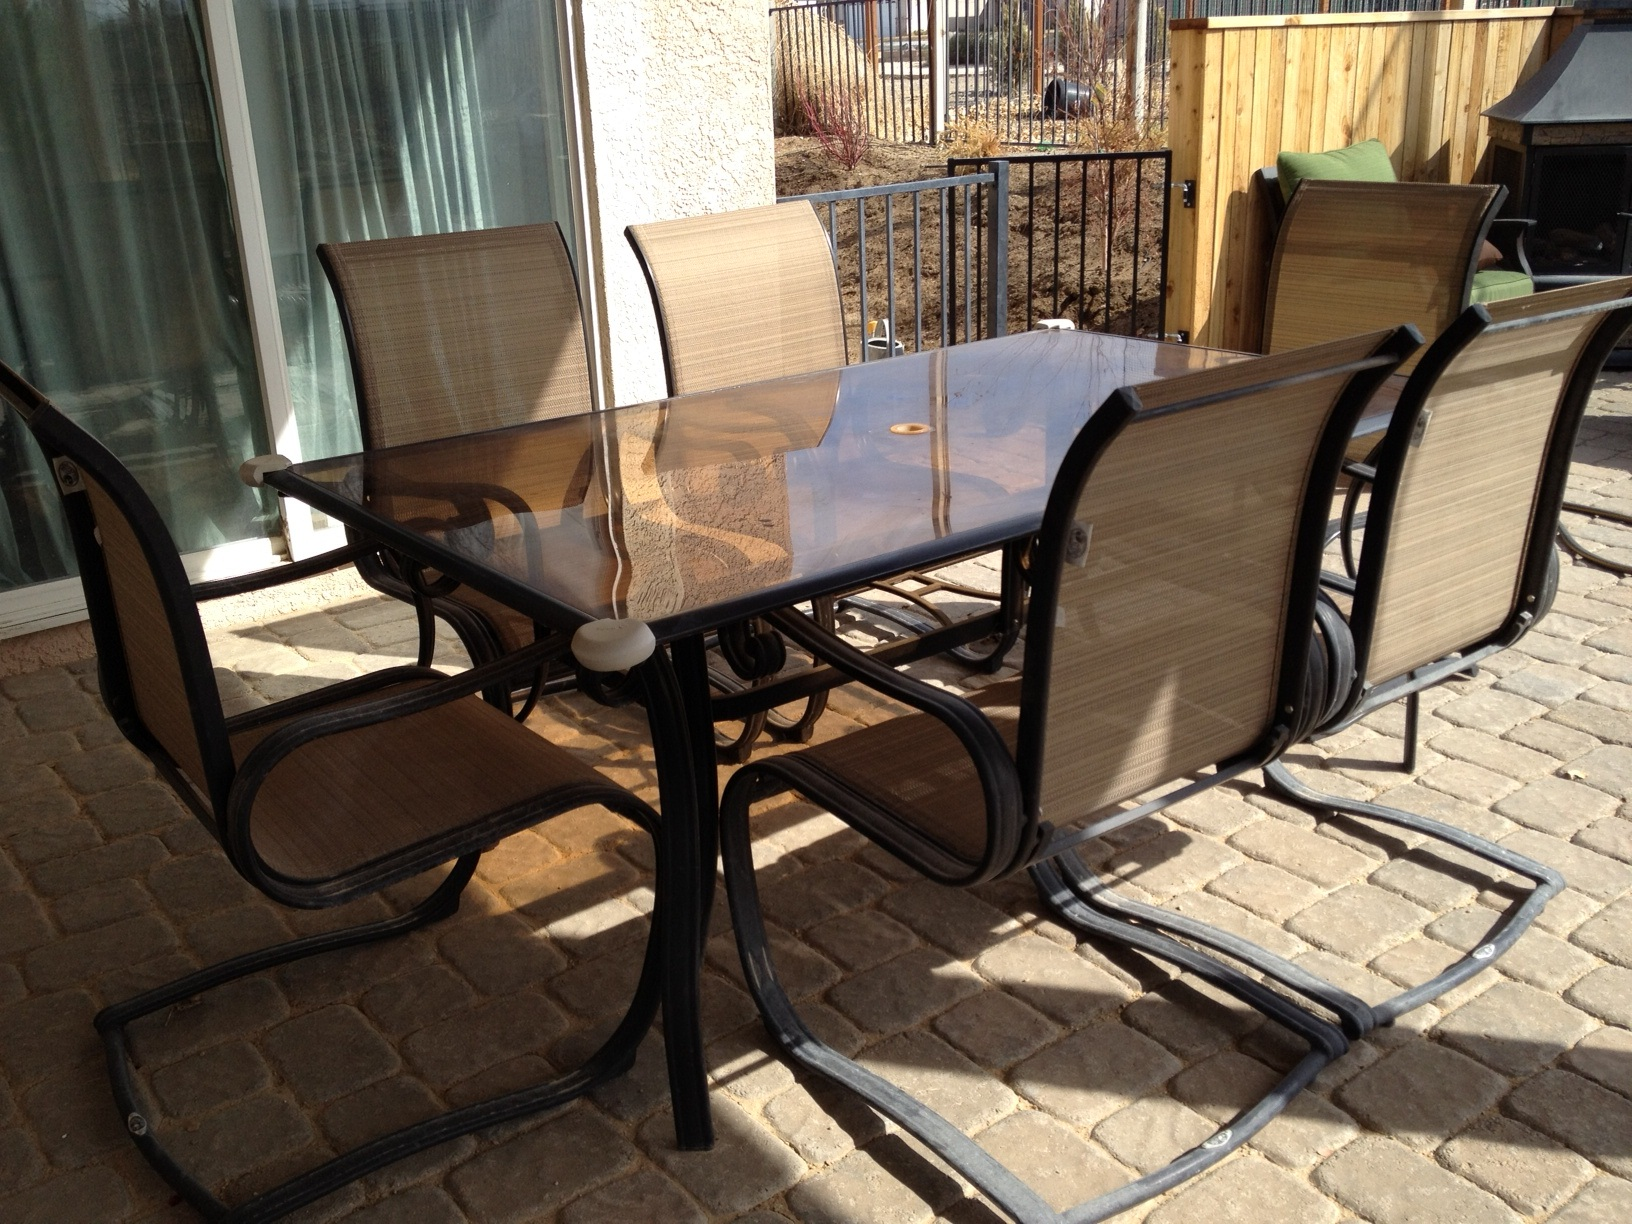 6 chair patio set decor ideas